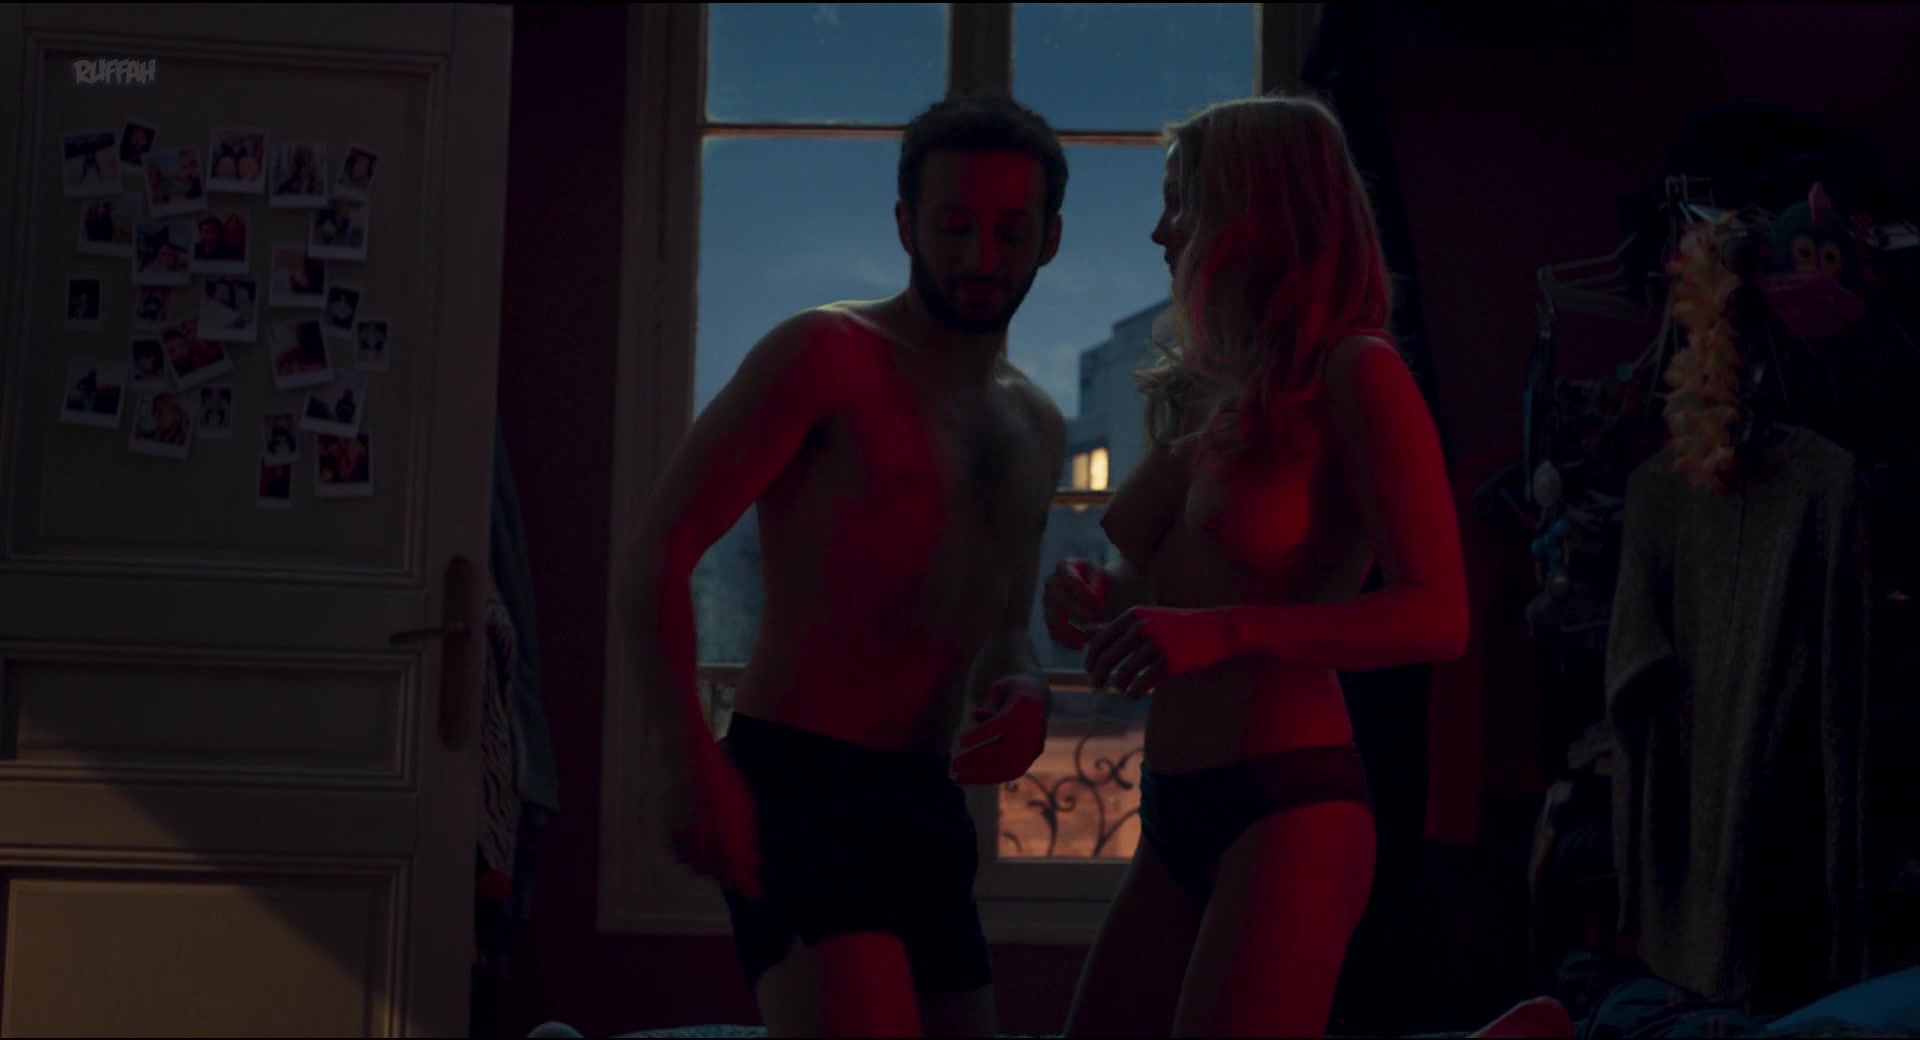 Margot bancilhon nackt